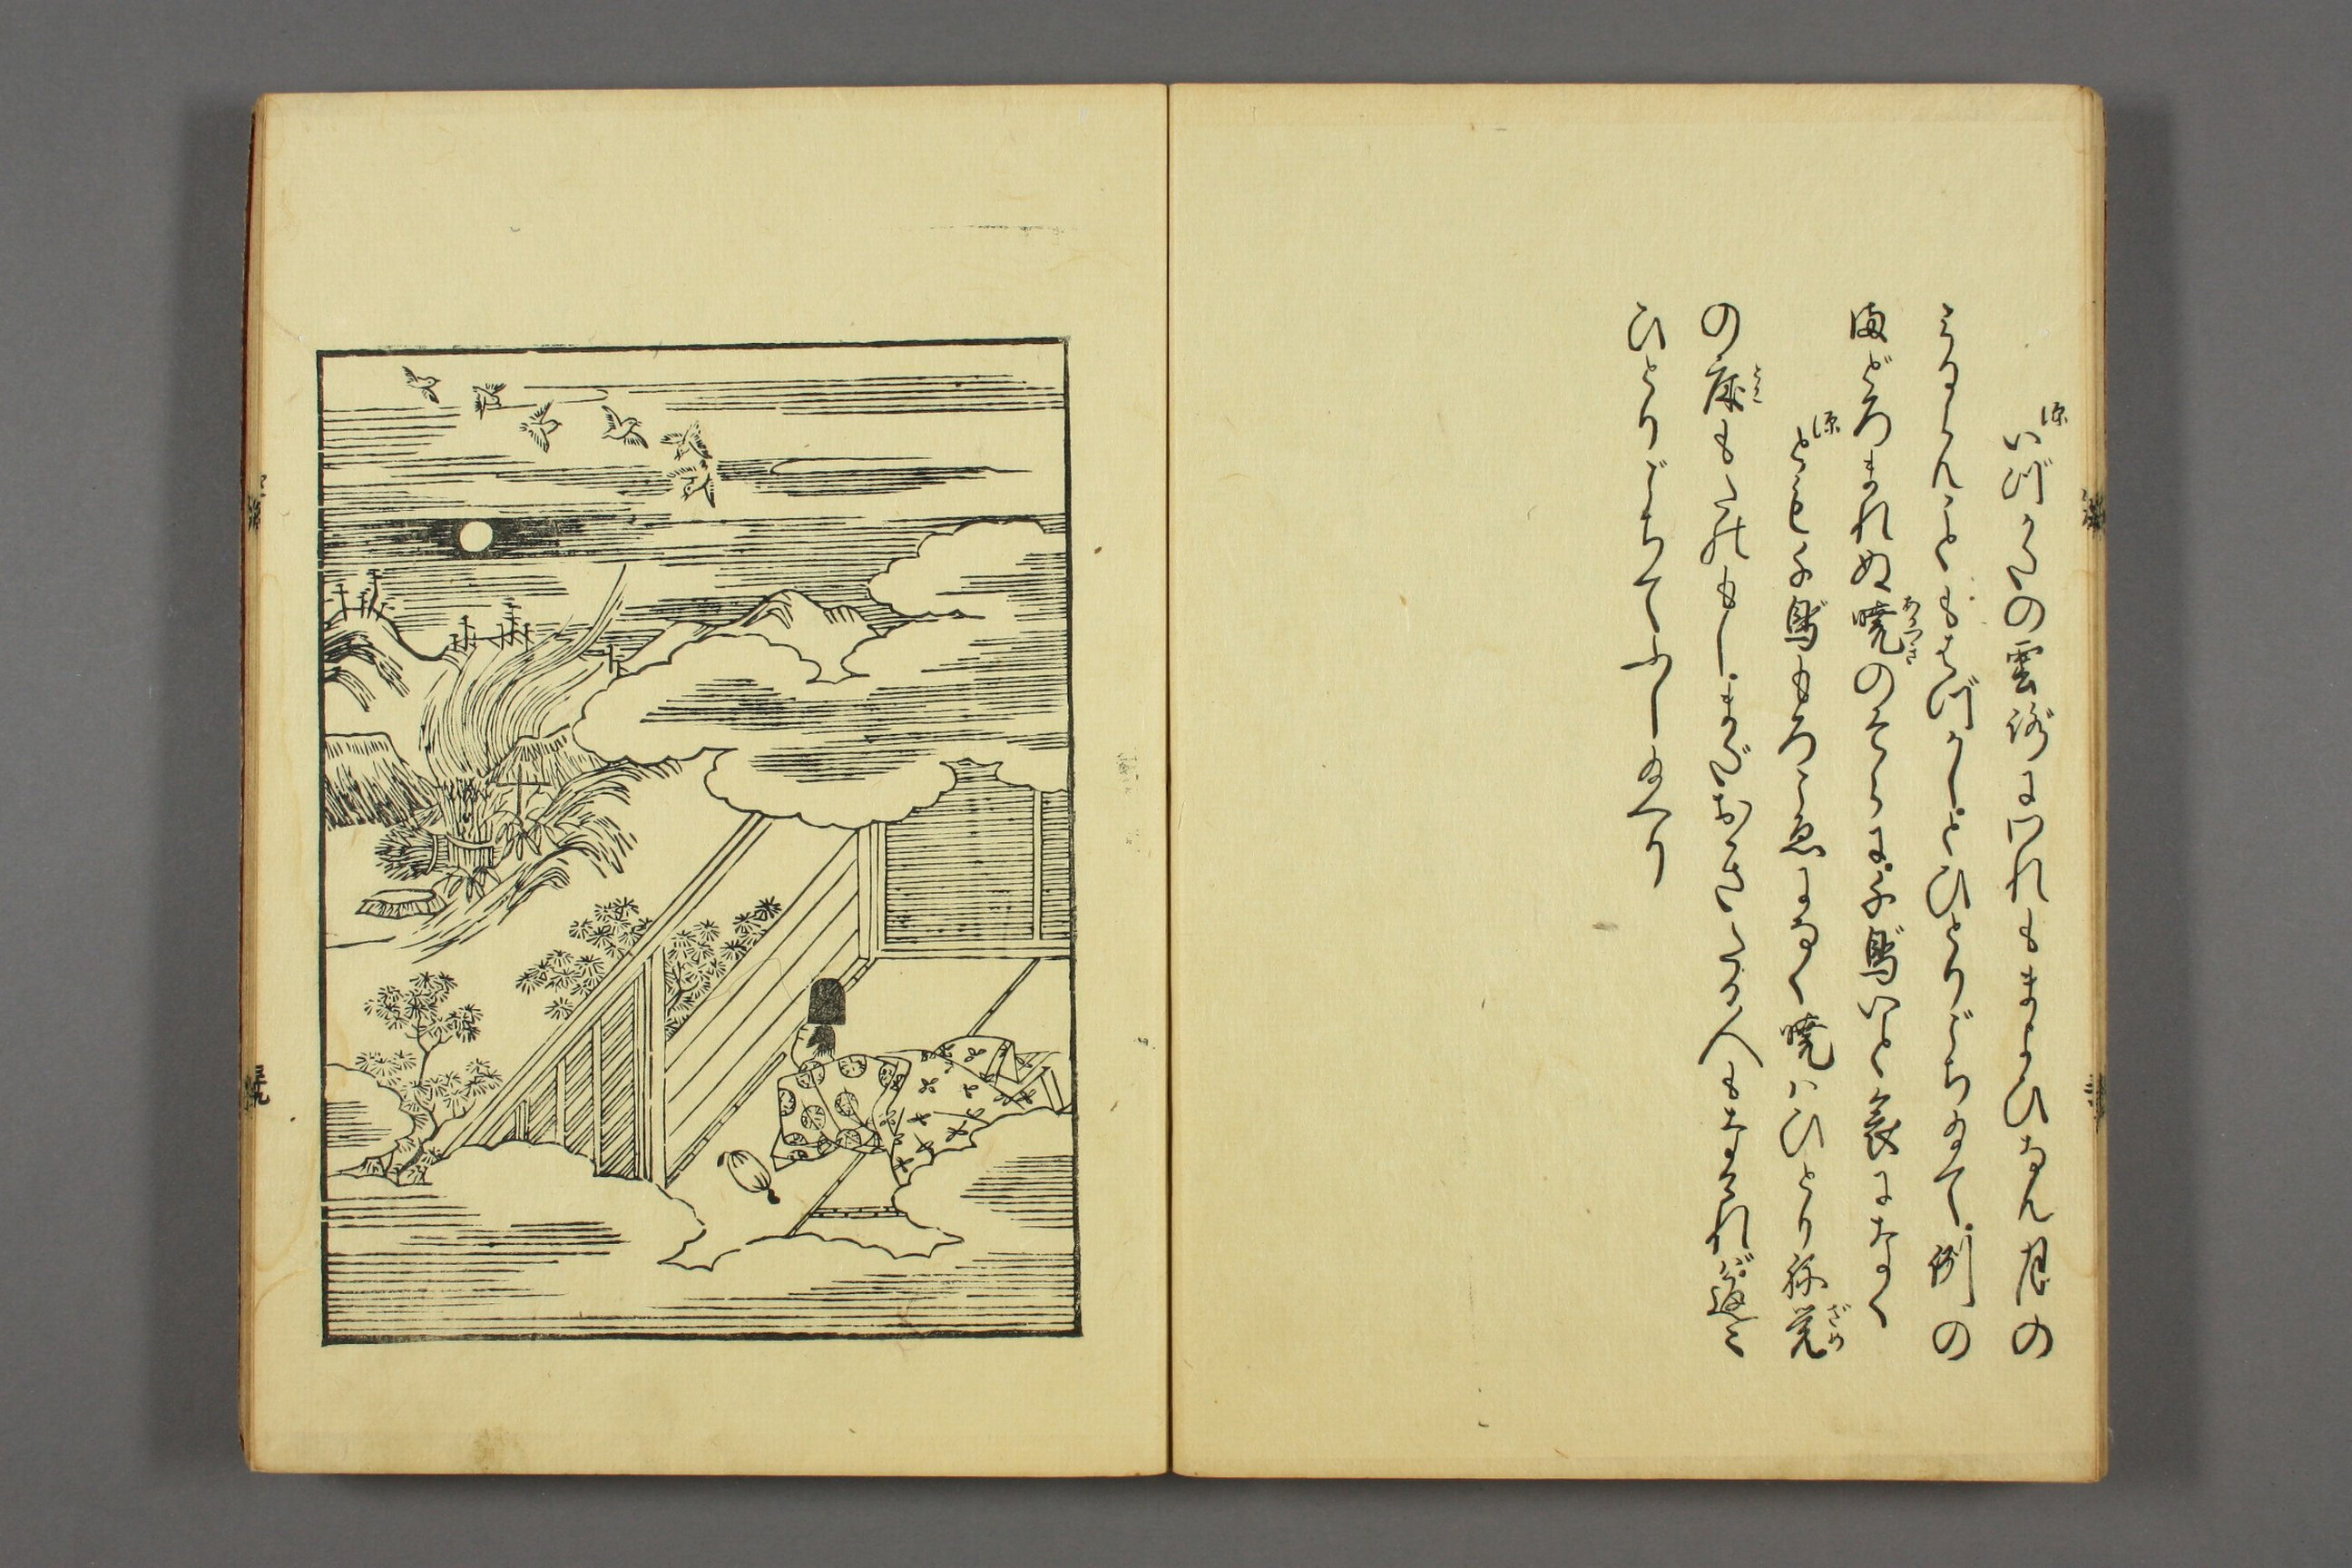 http://archive.wul.waseda.ac.jp/kosho/bunko30/bunko30_a0007/bunko30_a0007_0012/bunko30_a0007_0012_p0040.jpg